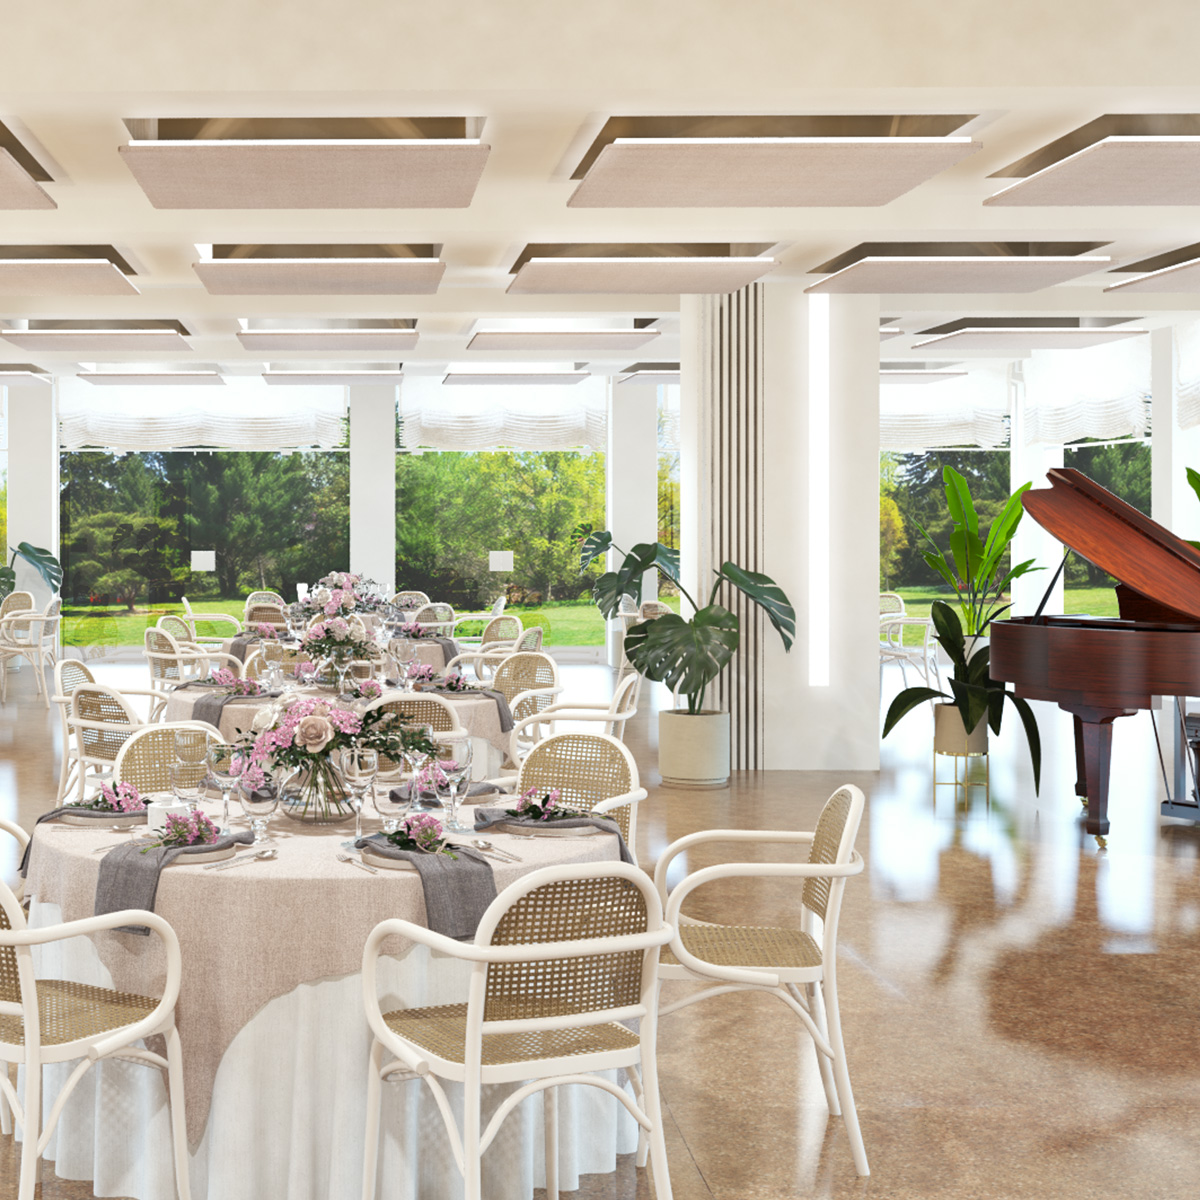 Offerte Riapertura Hotel dei giardini